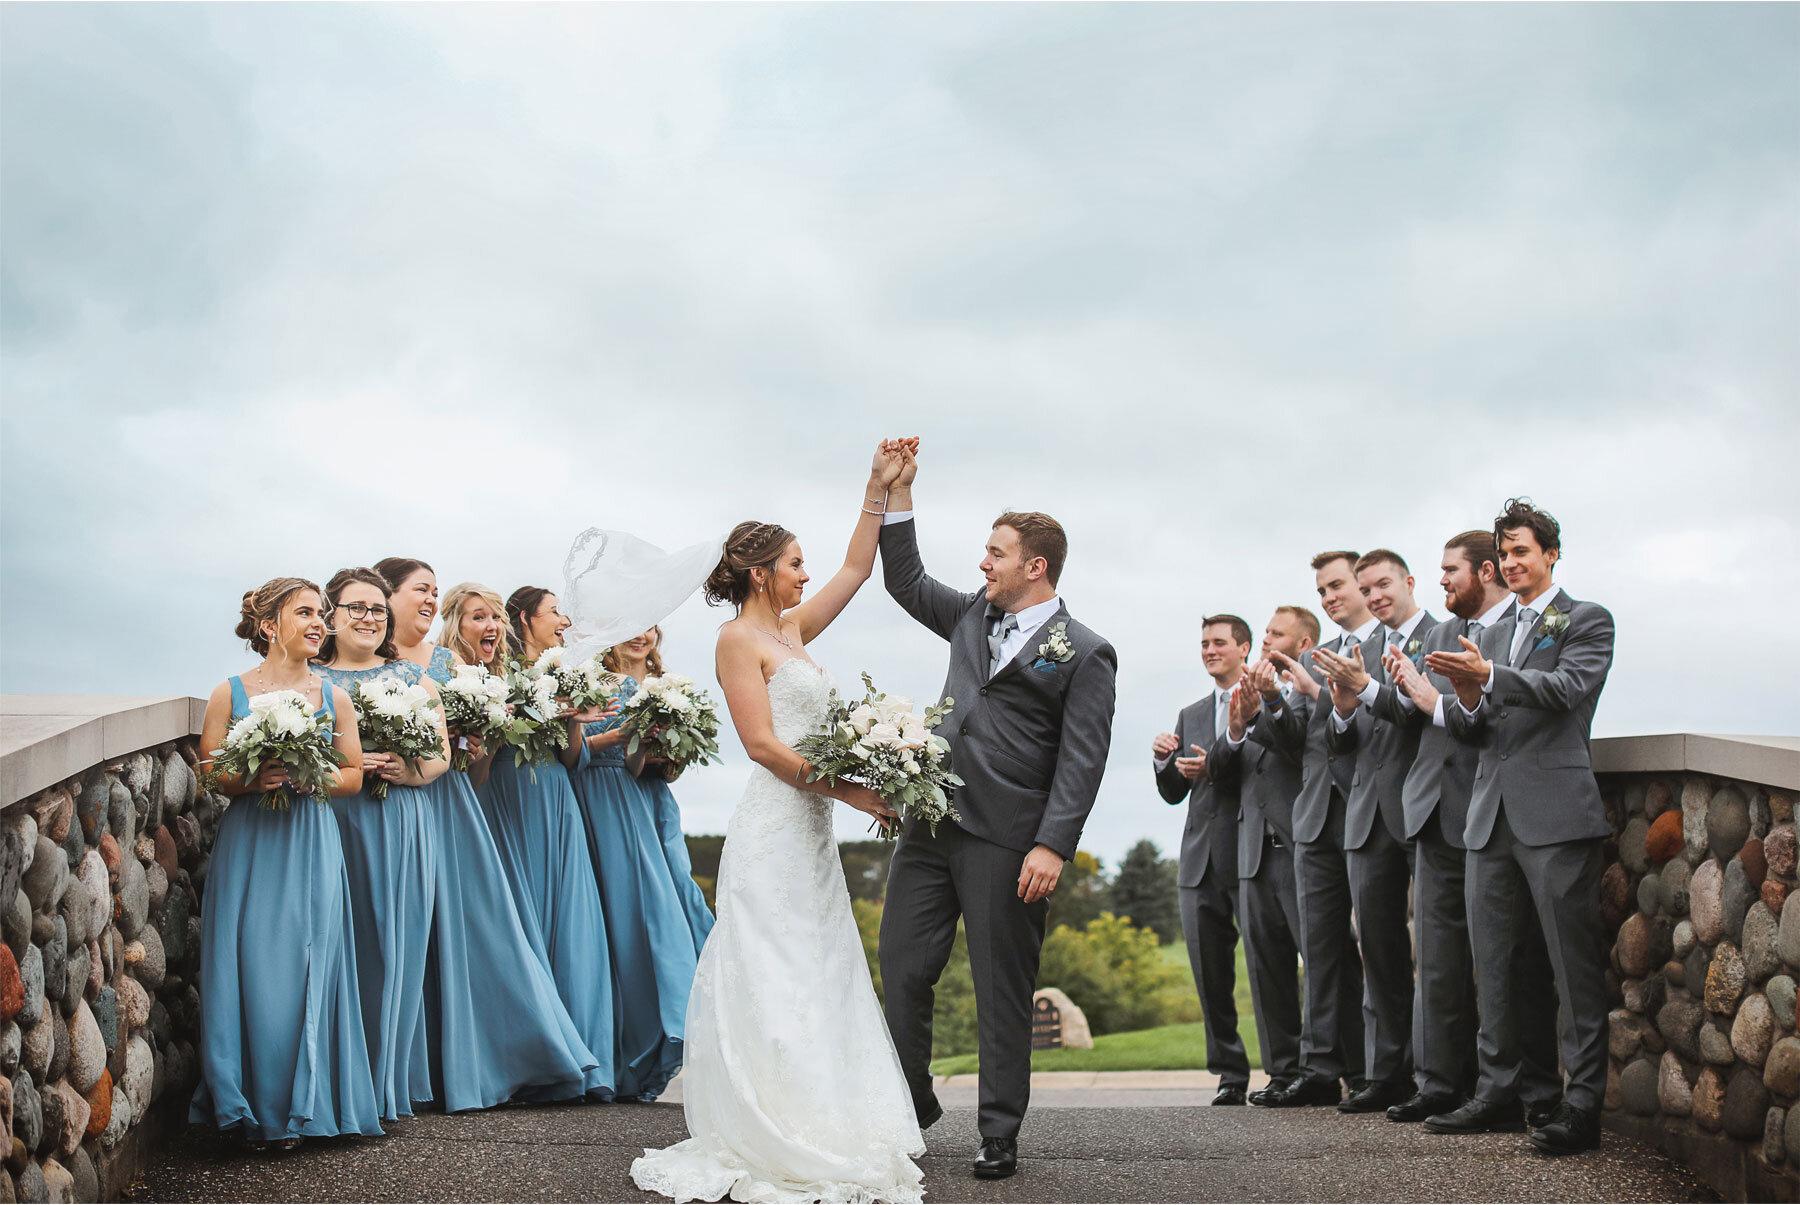 07-Vick-Photography-Minneapolis-Minnesota-Wedding-Rush-Creek-Golf-Club-Groom-Bride-Bridesmaids-Groomsmen-Amanda-and-Michael.jpg